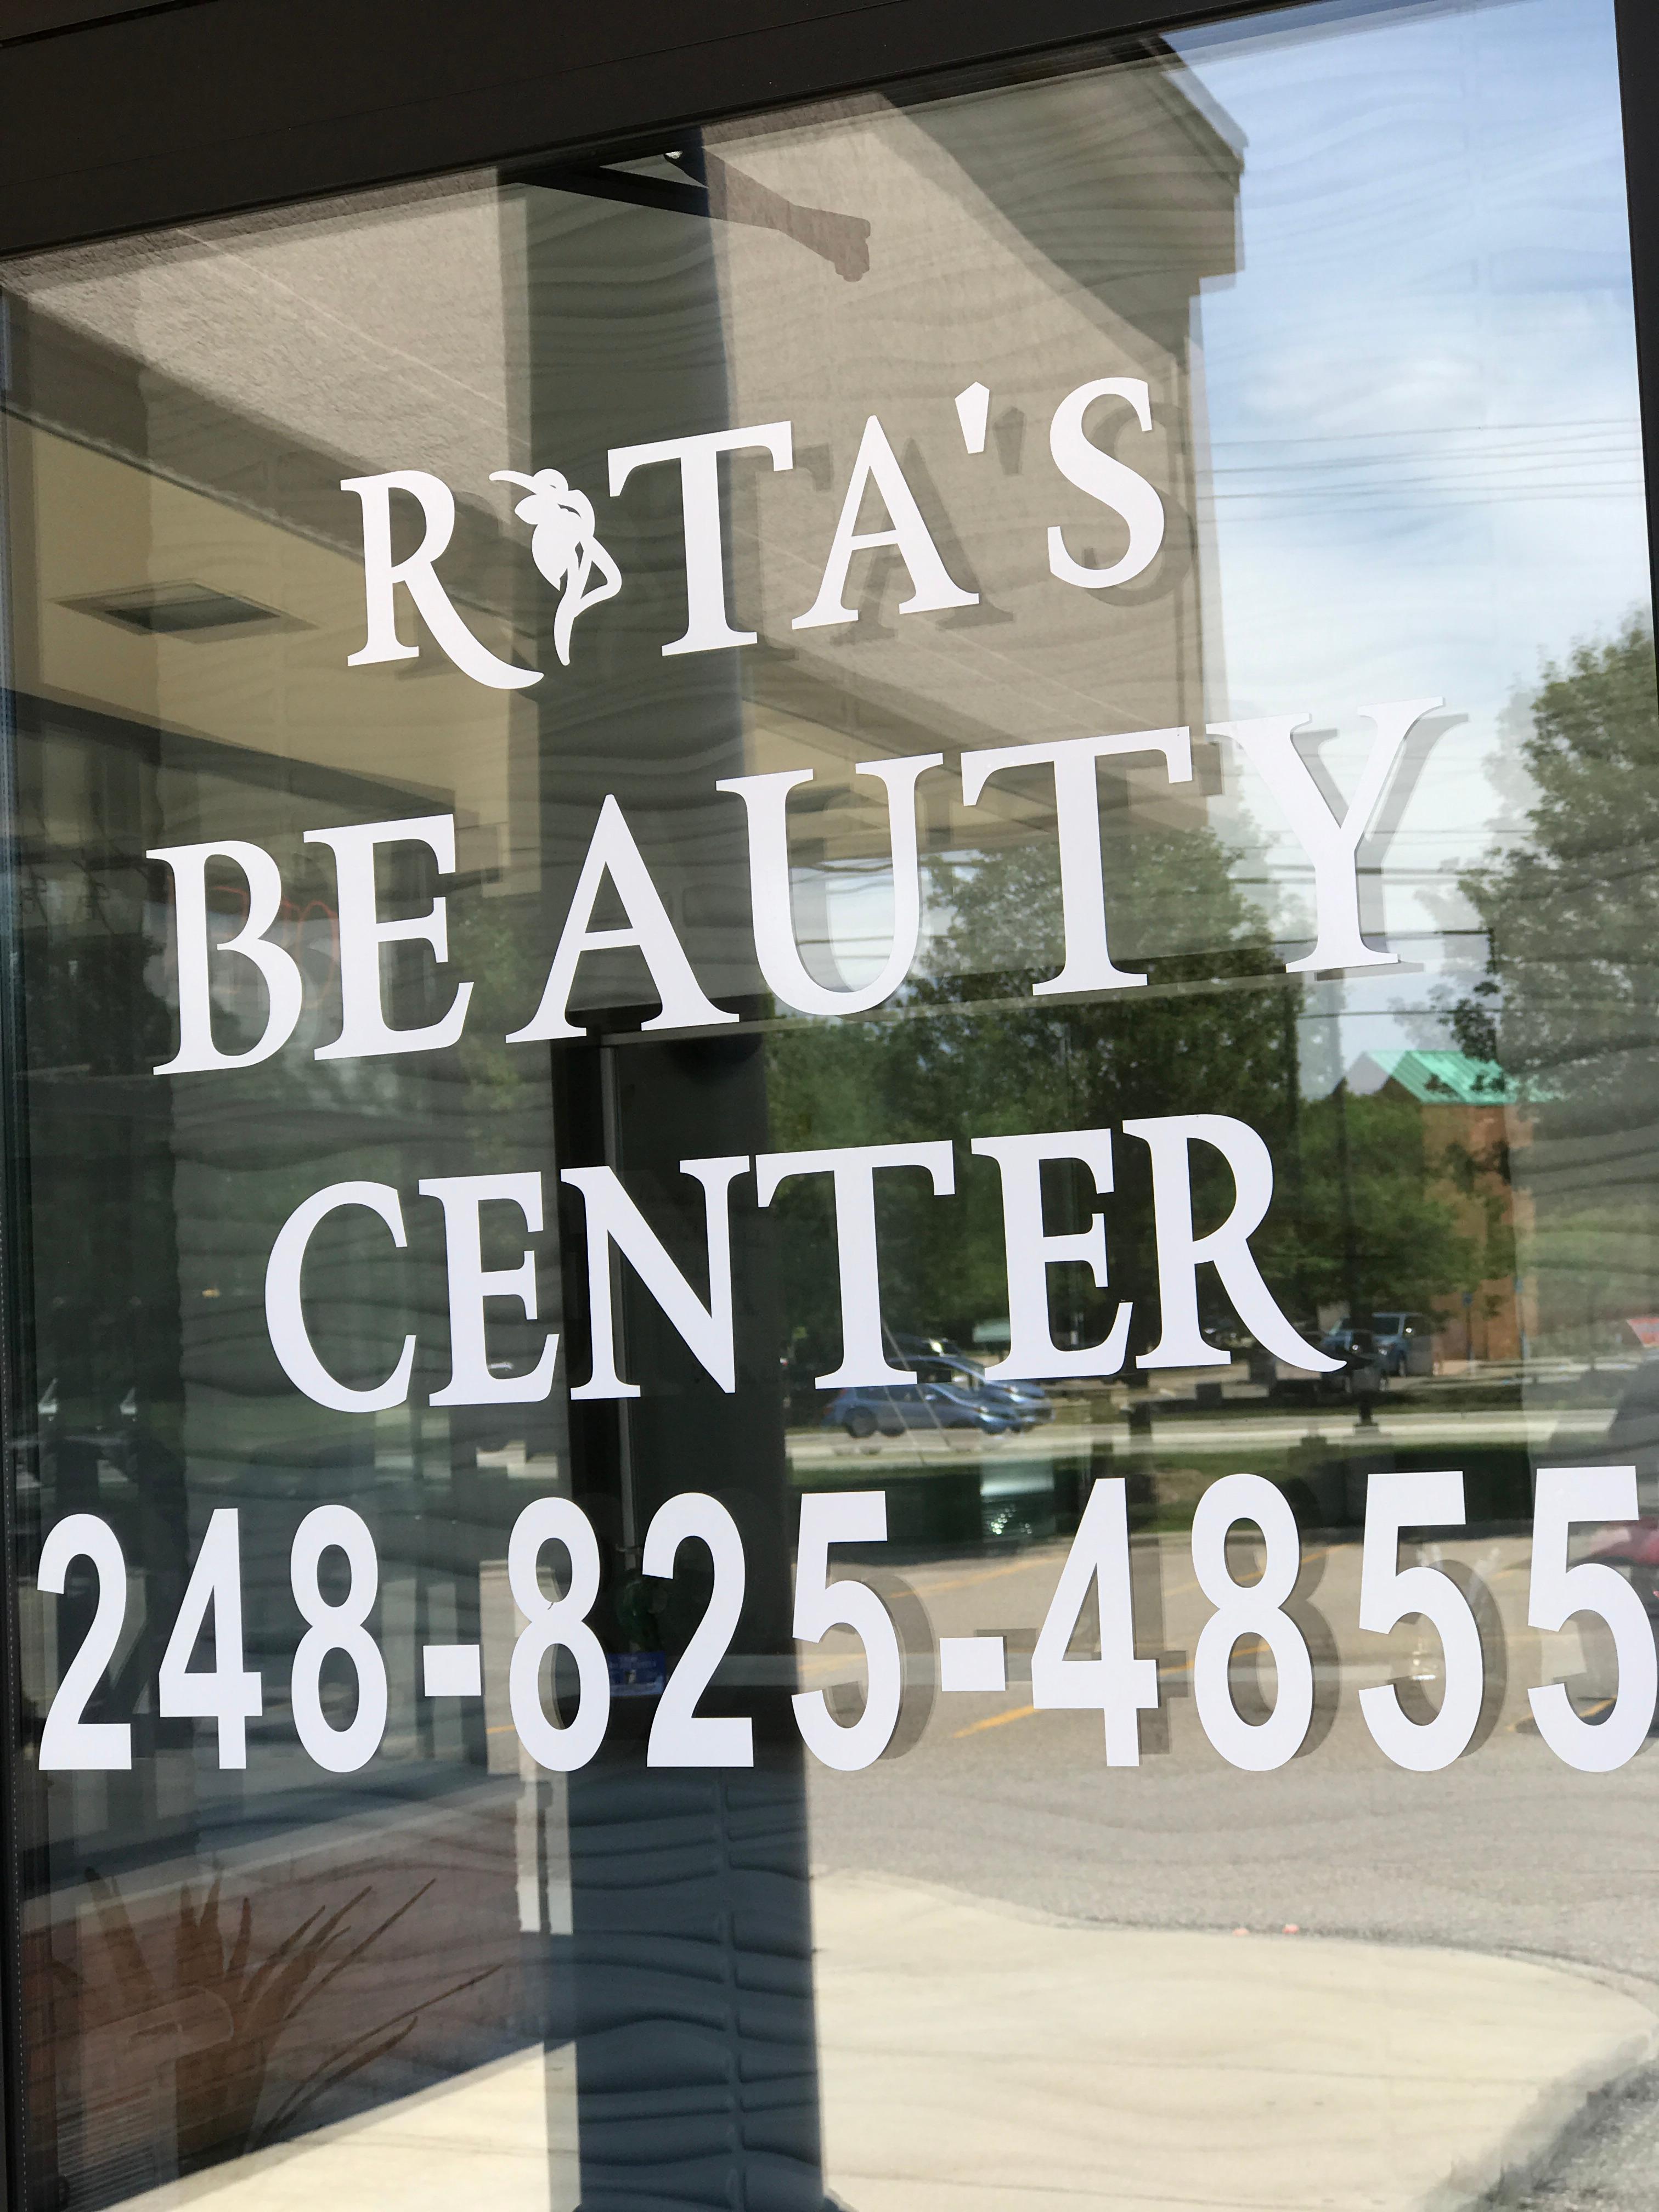 Troy Skin Care Center image 9